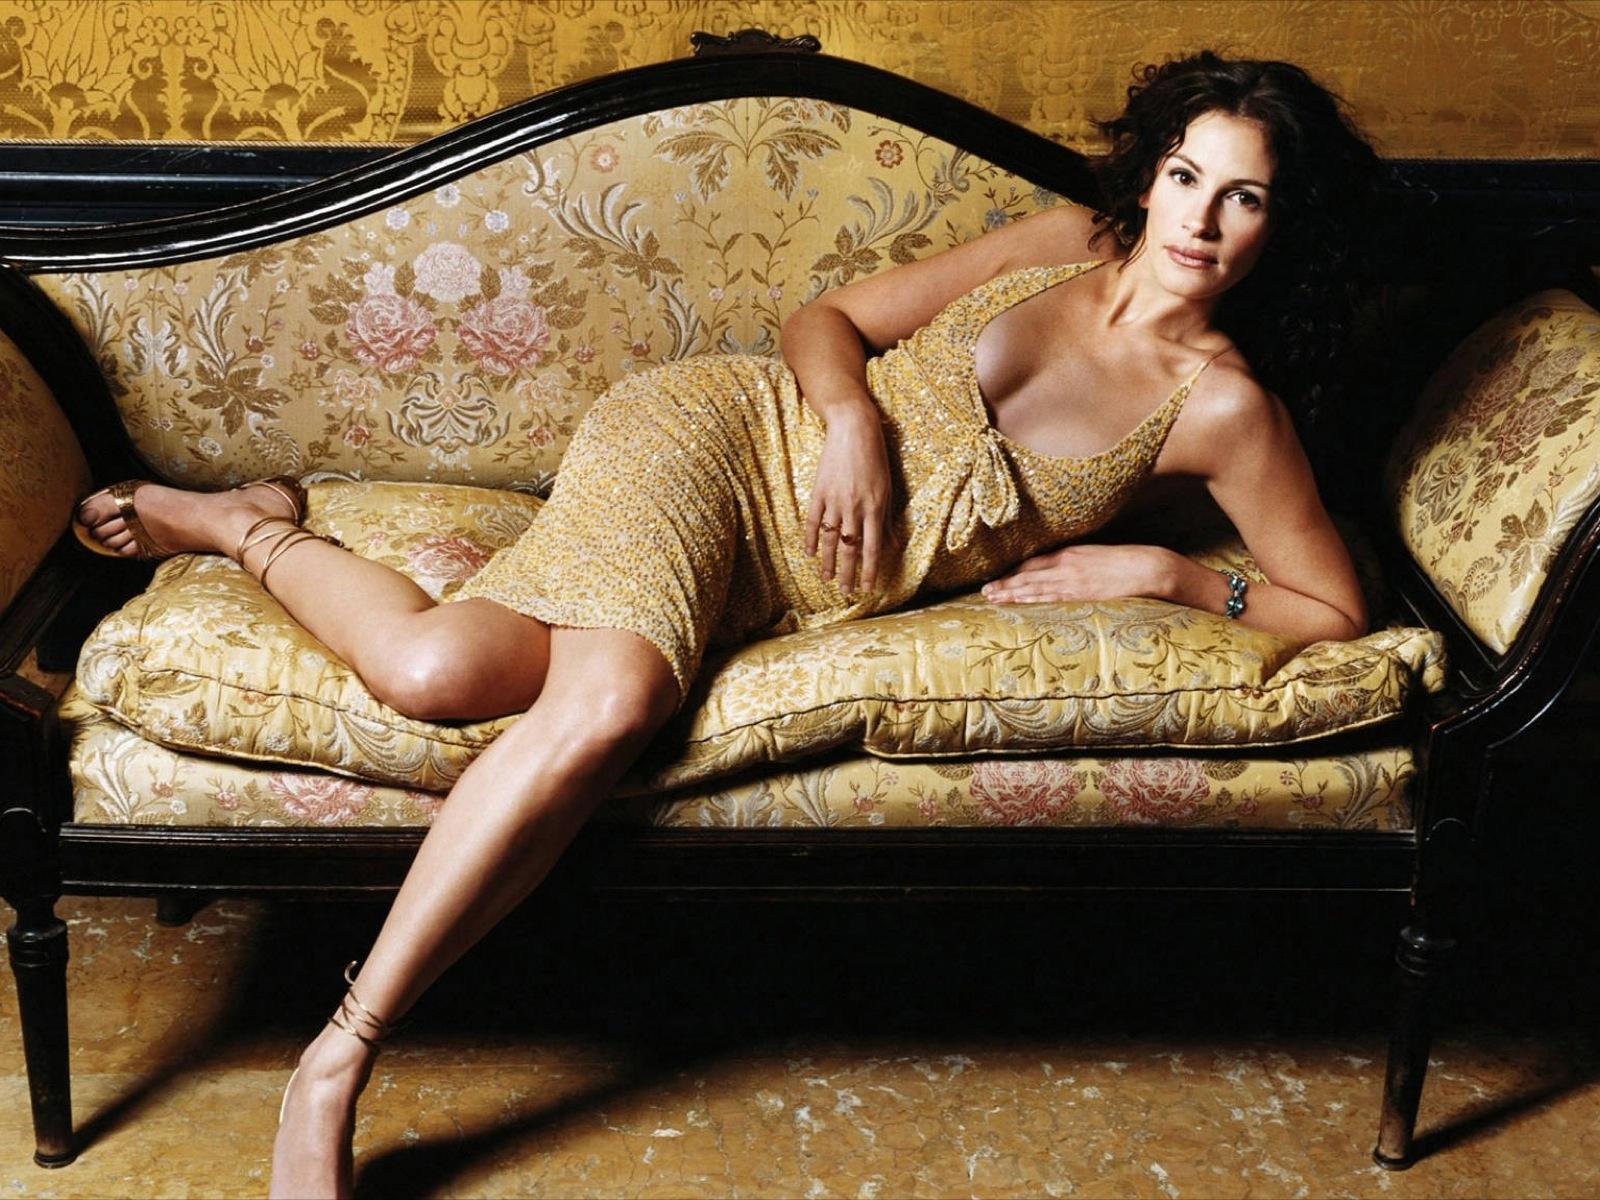 Hot Bio Celebrity Pictures: Julia Roberts Hot Wallpapers